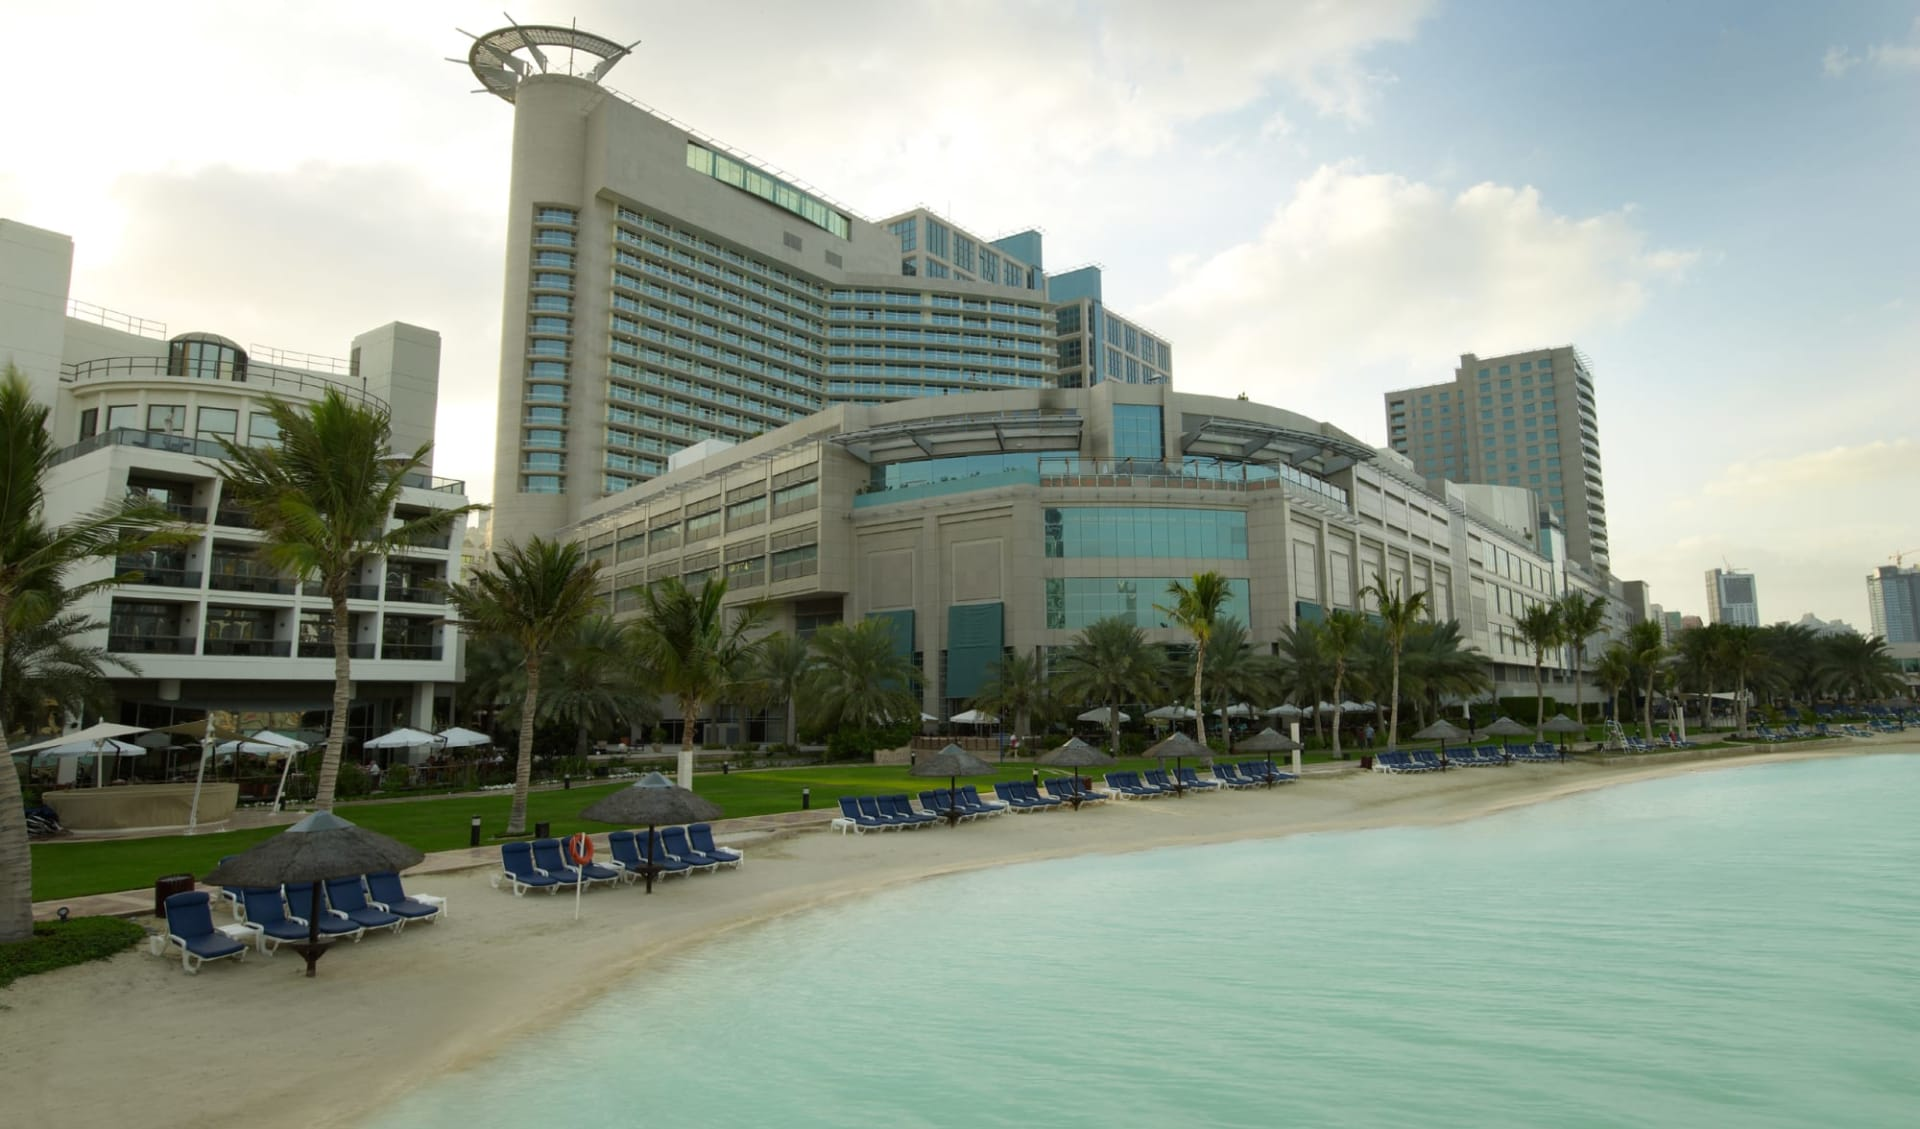 Beach Rotana Hotel & Towers in Abu Dhabi: